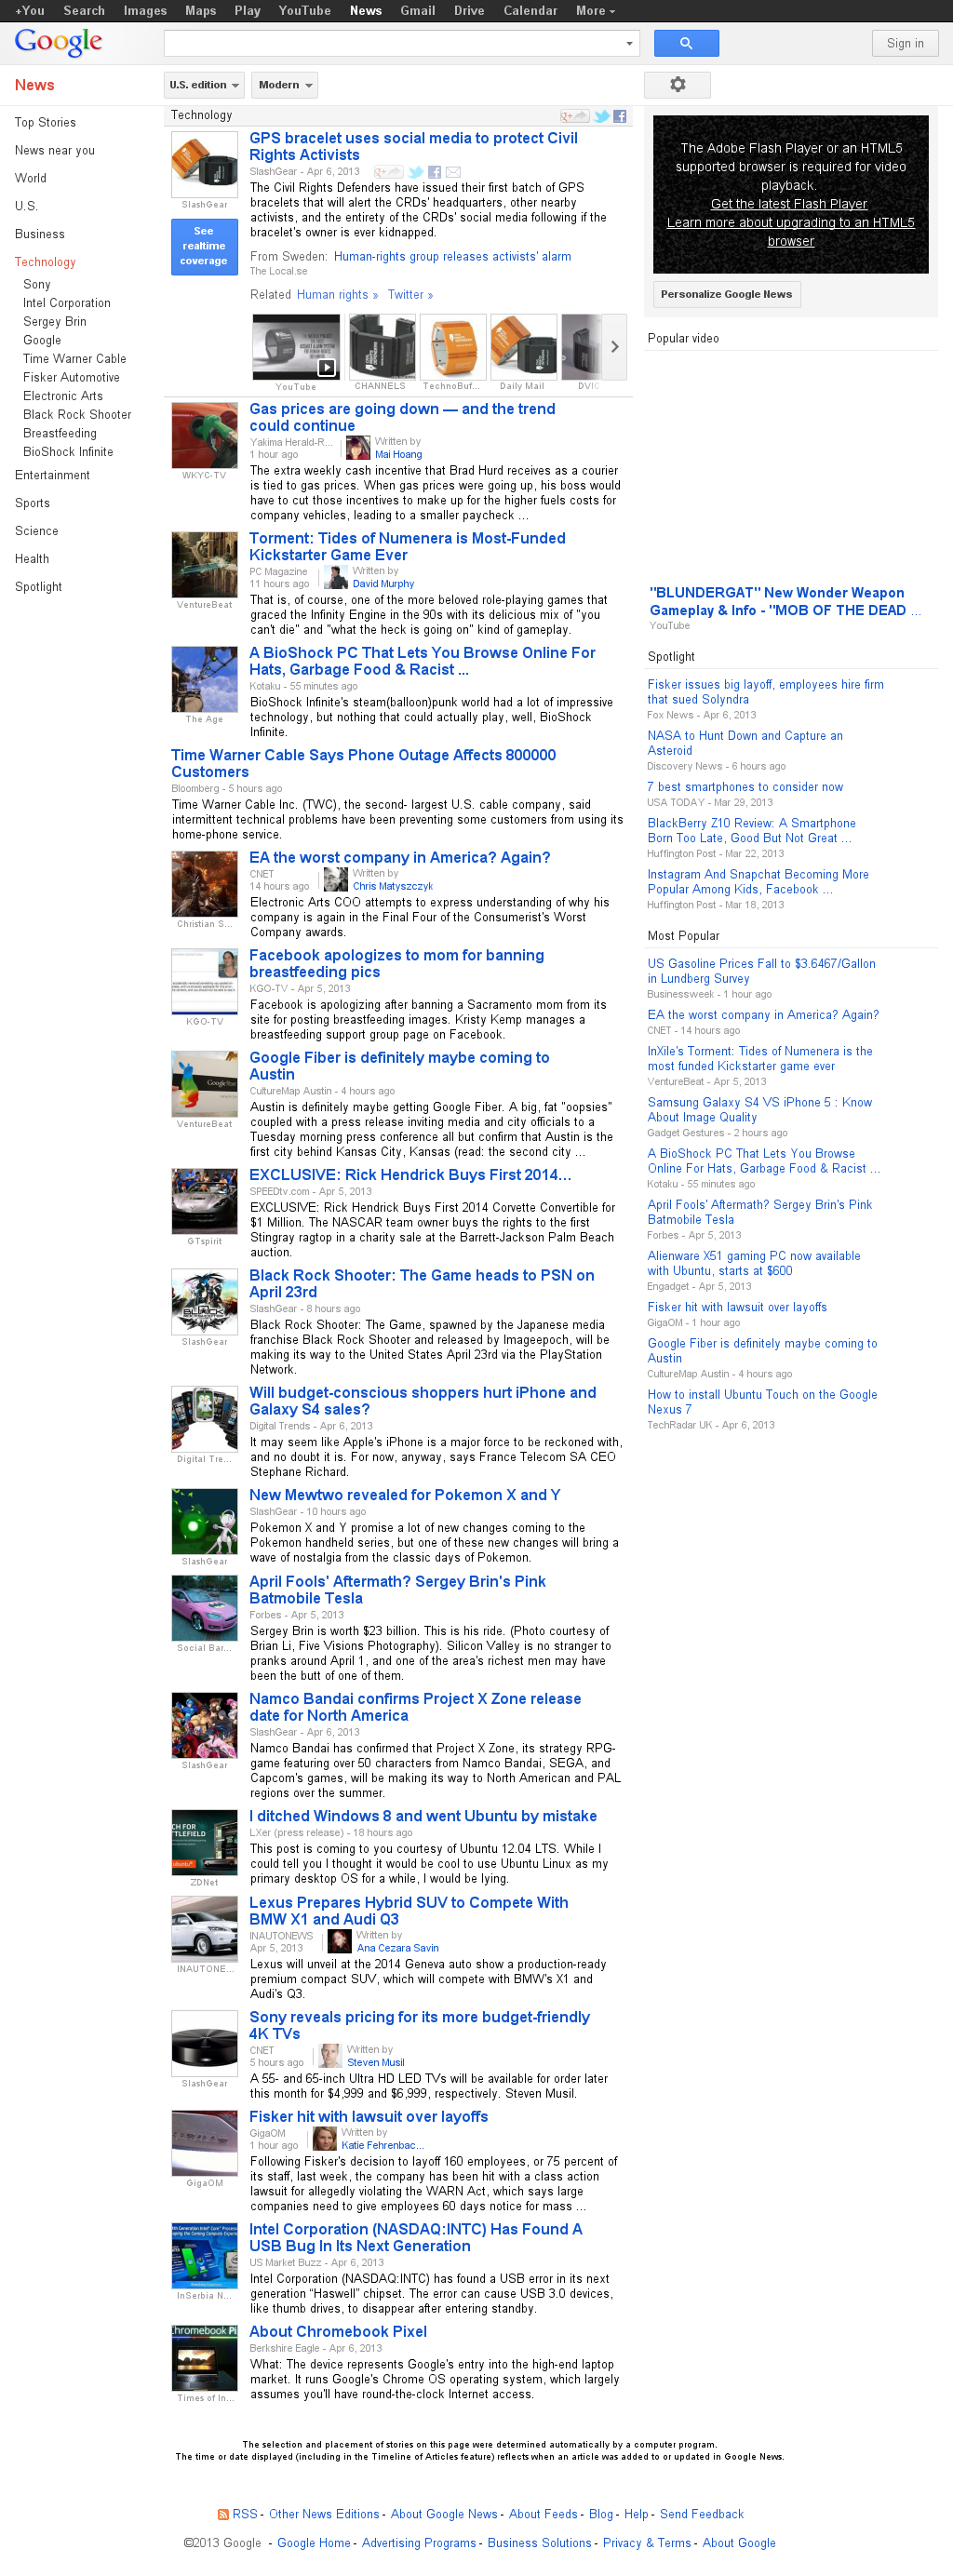 Google News: Technology at Monday April 8, 2013, 6:08 a.m. UTC